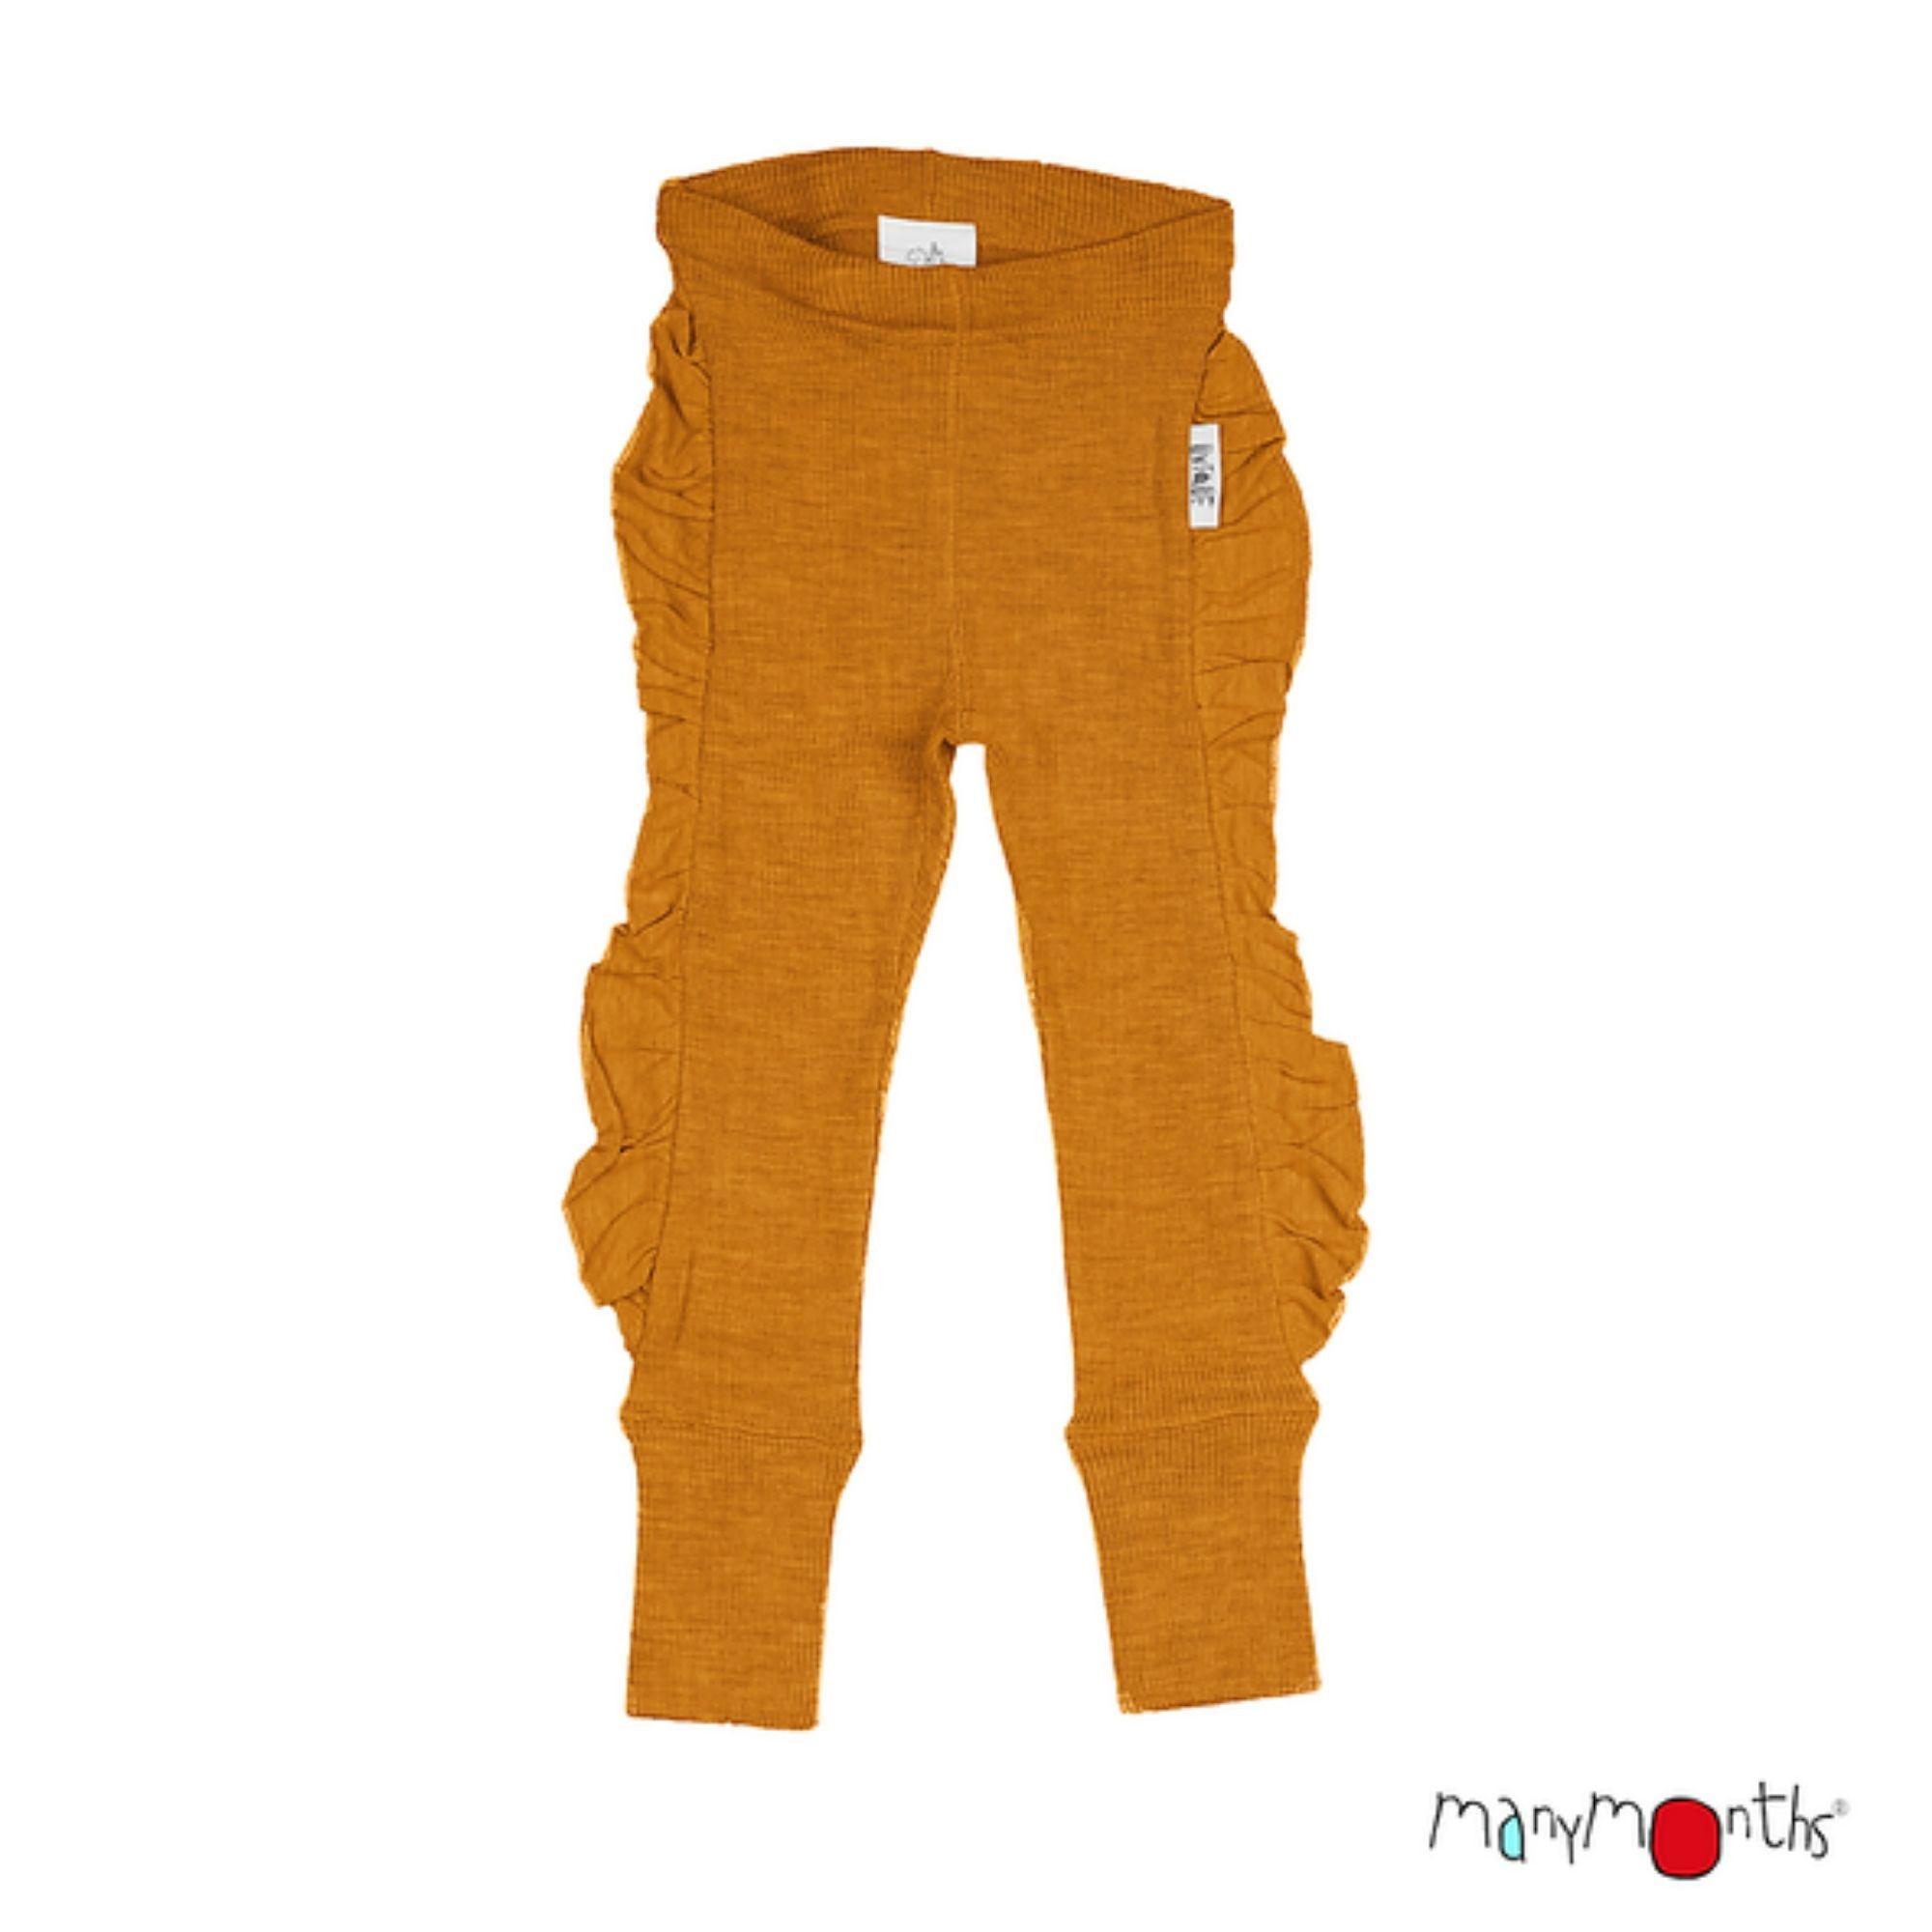 legging-enfant-evolutif-pure-laine-merinos-manymonths-maison-de-mamoulia-honey-bread-jaune